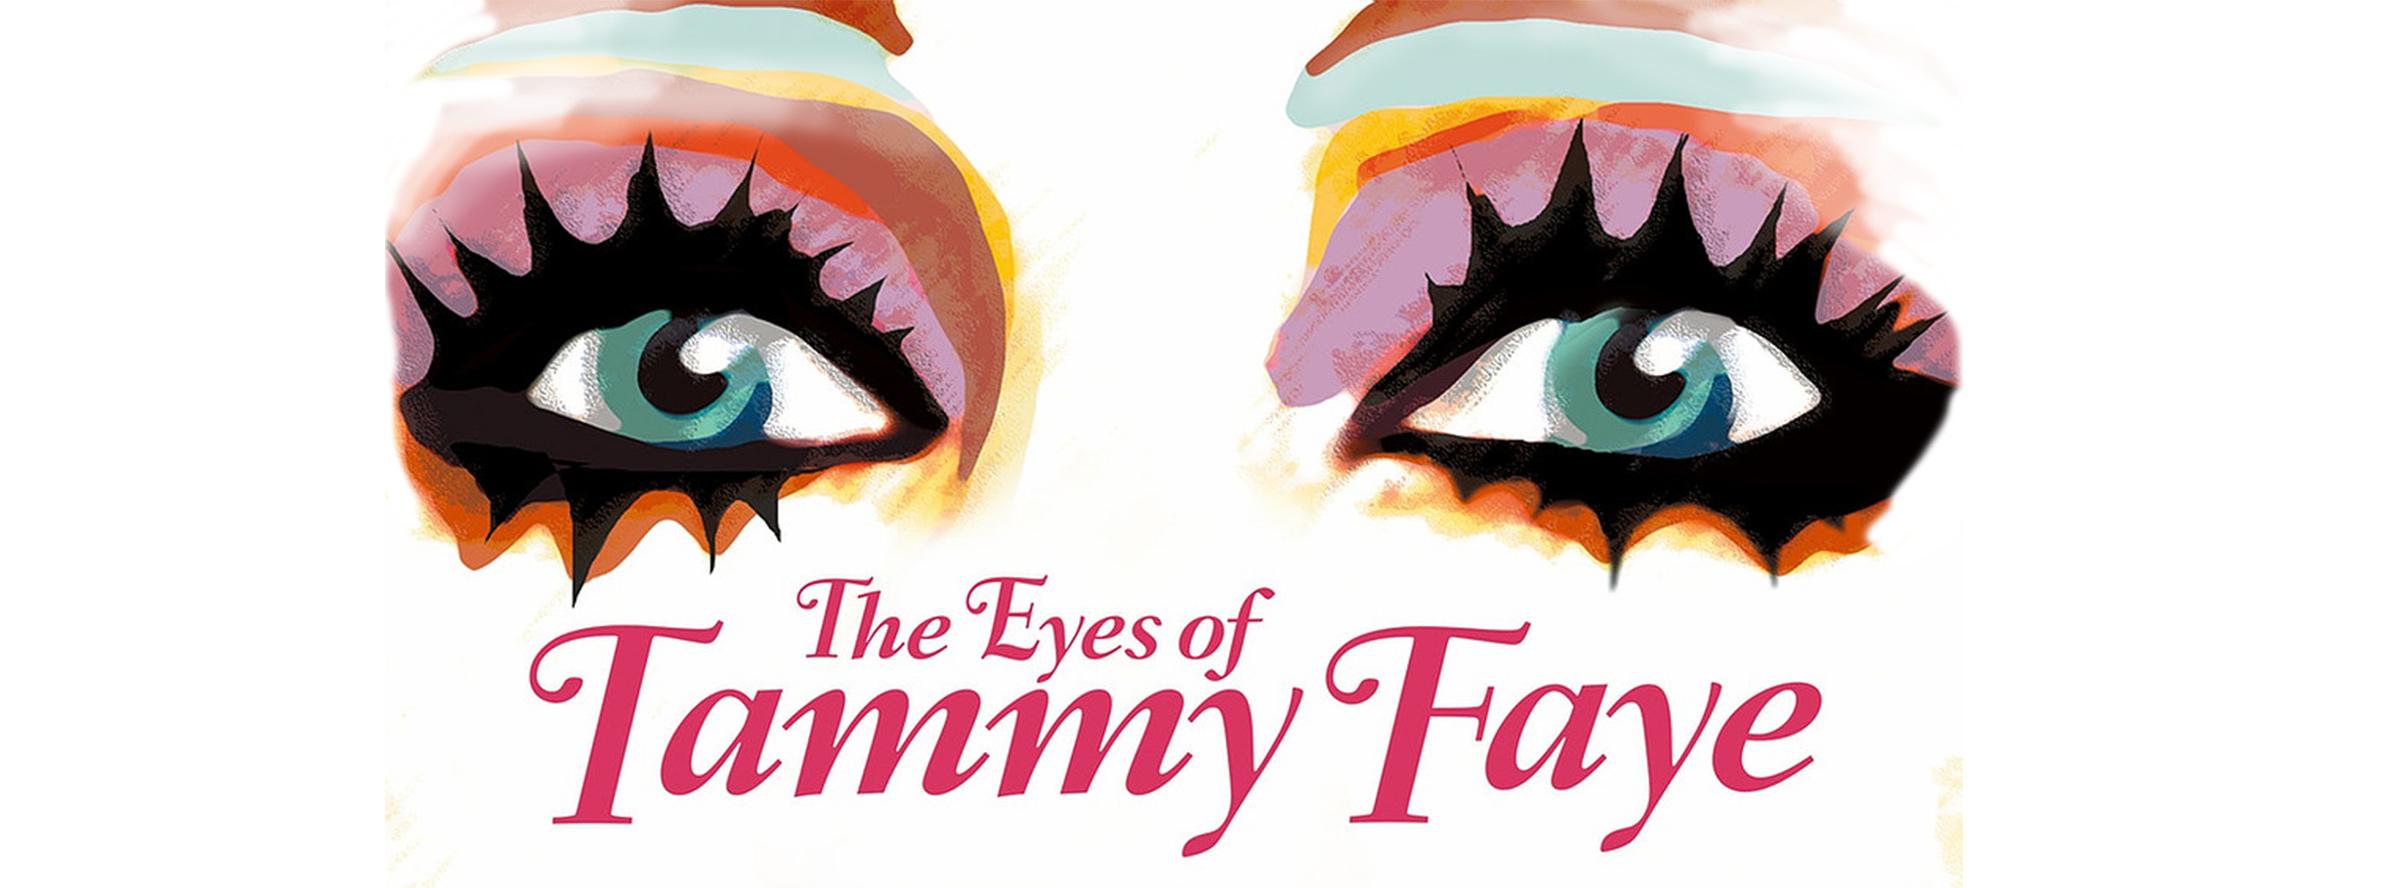 Slider Image for Eyes of Tammy Faye, The